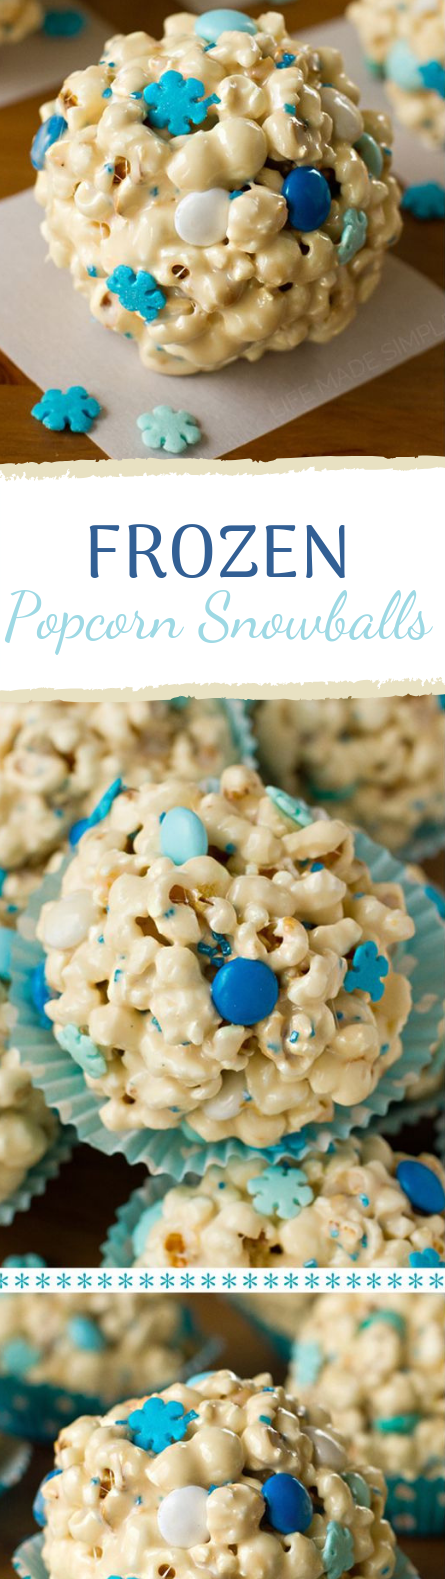 Popcorn Snowballs #party #desserts